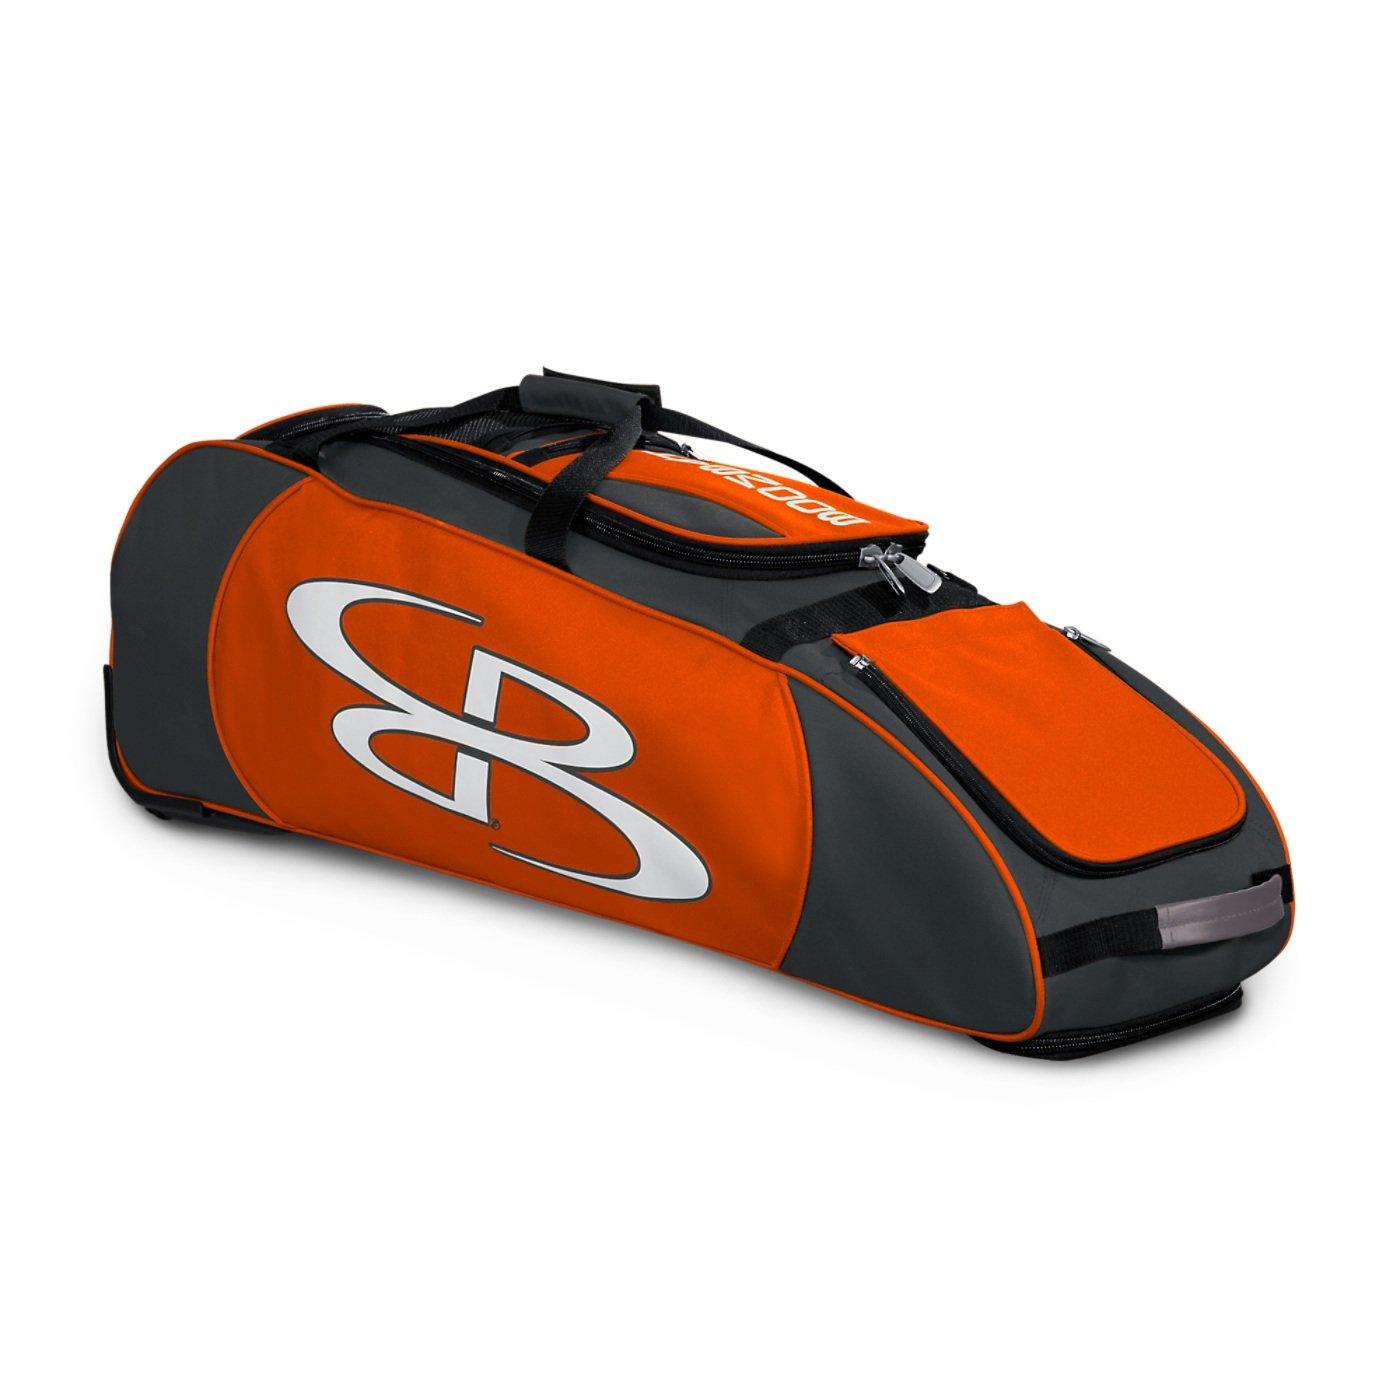 Boombah Spartan ローリングバットバッグ 野球用 ソフトボール用 38インチ×12-1/2インチ×12インチ 43種類のカラーオプション 4本のバット他  Dark Charcoal/Orange B01NBE45LH